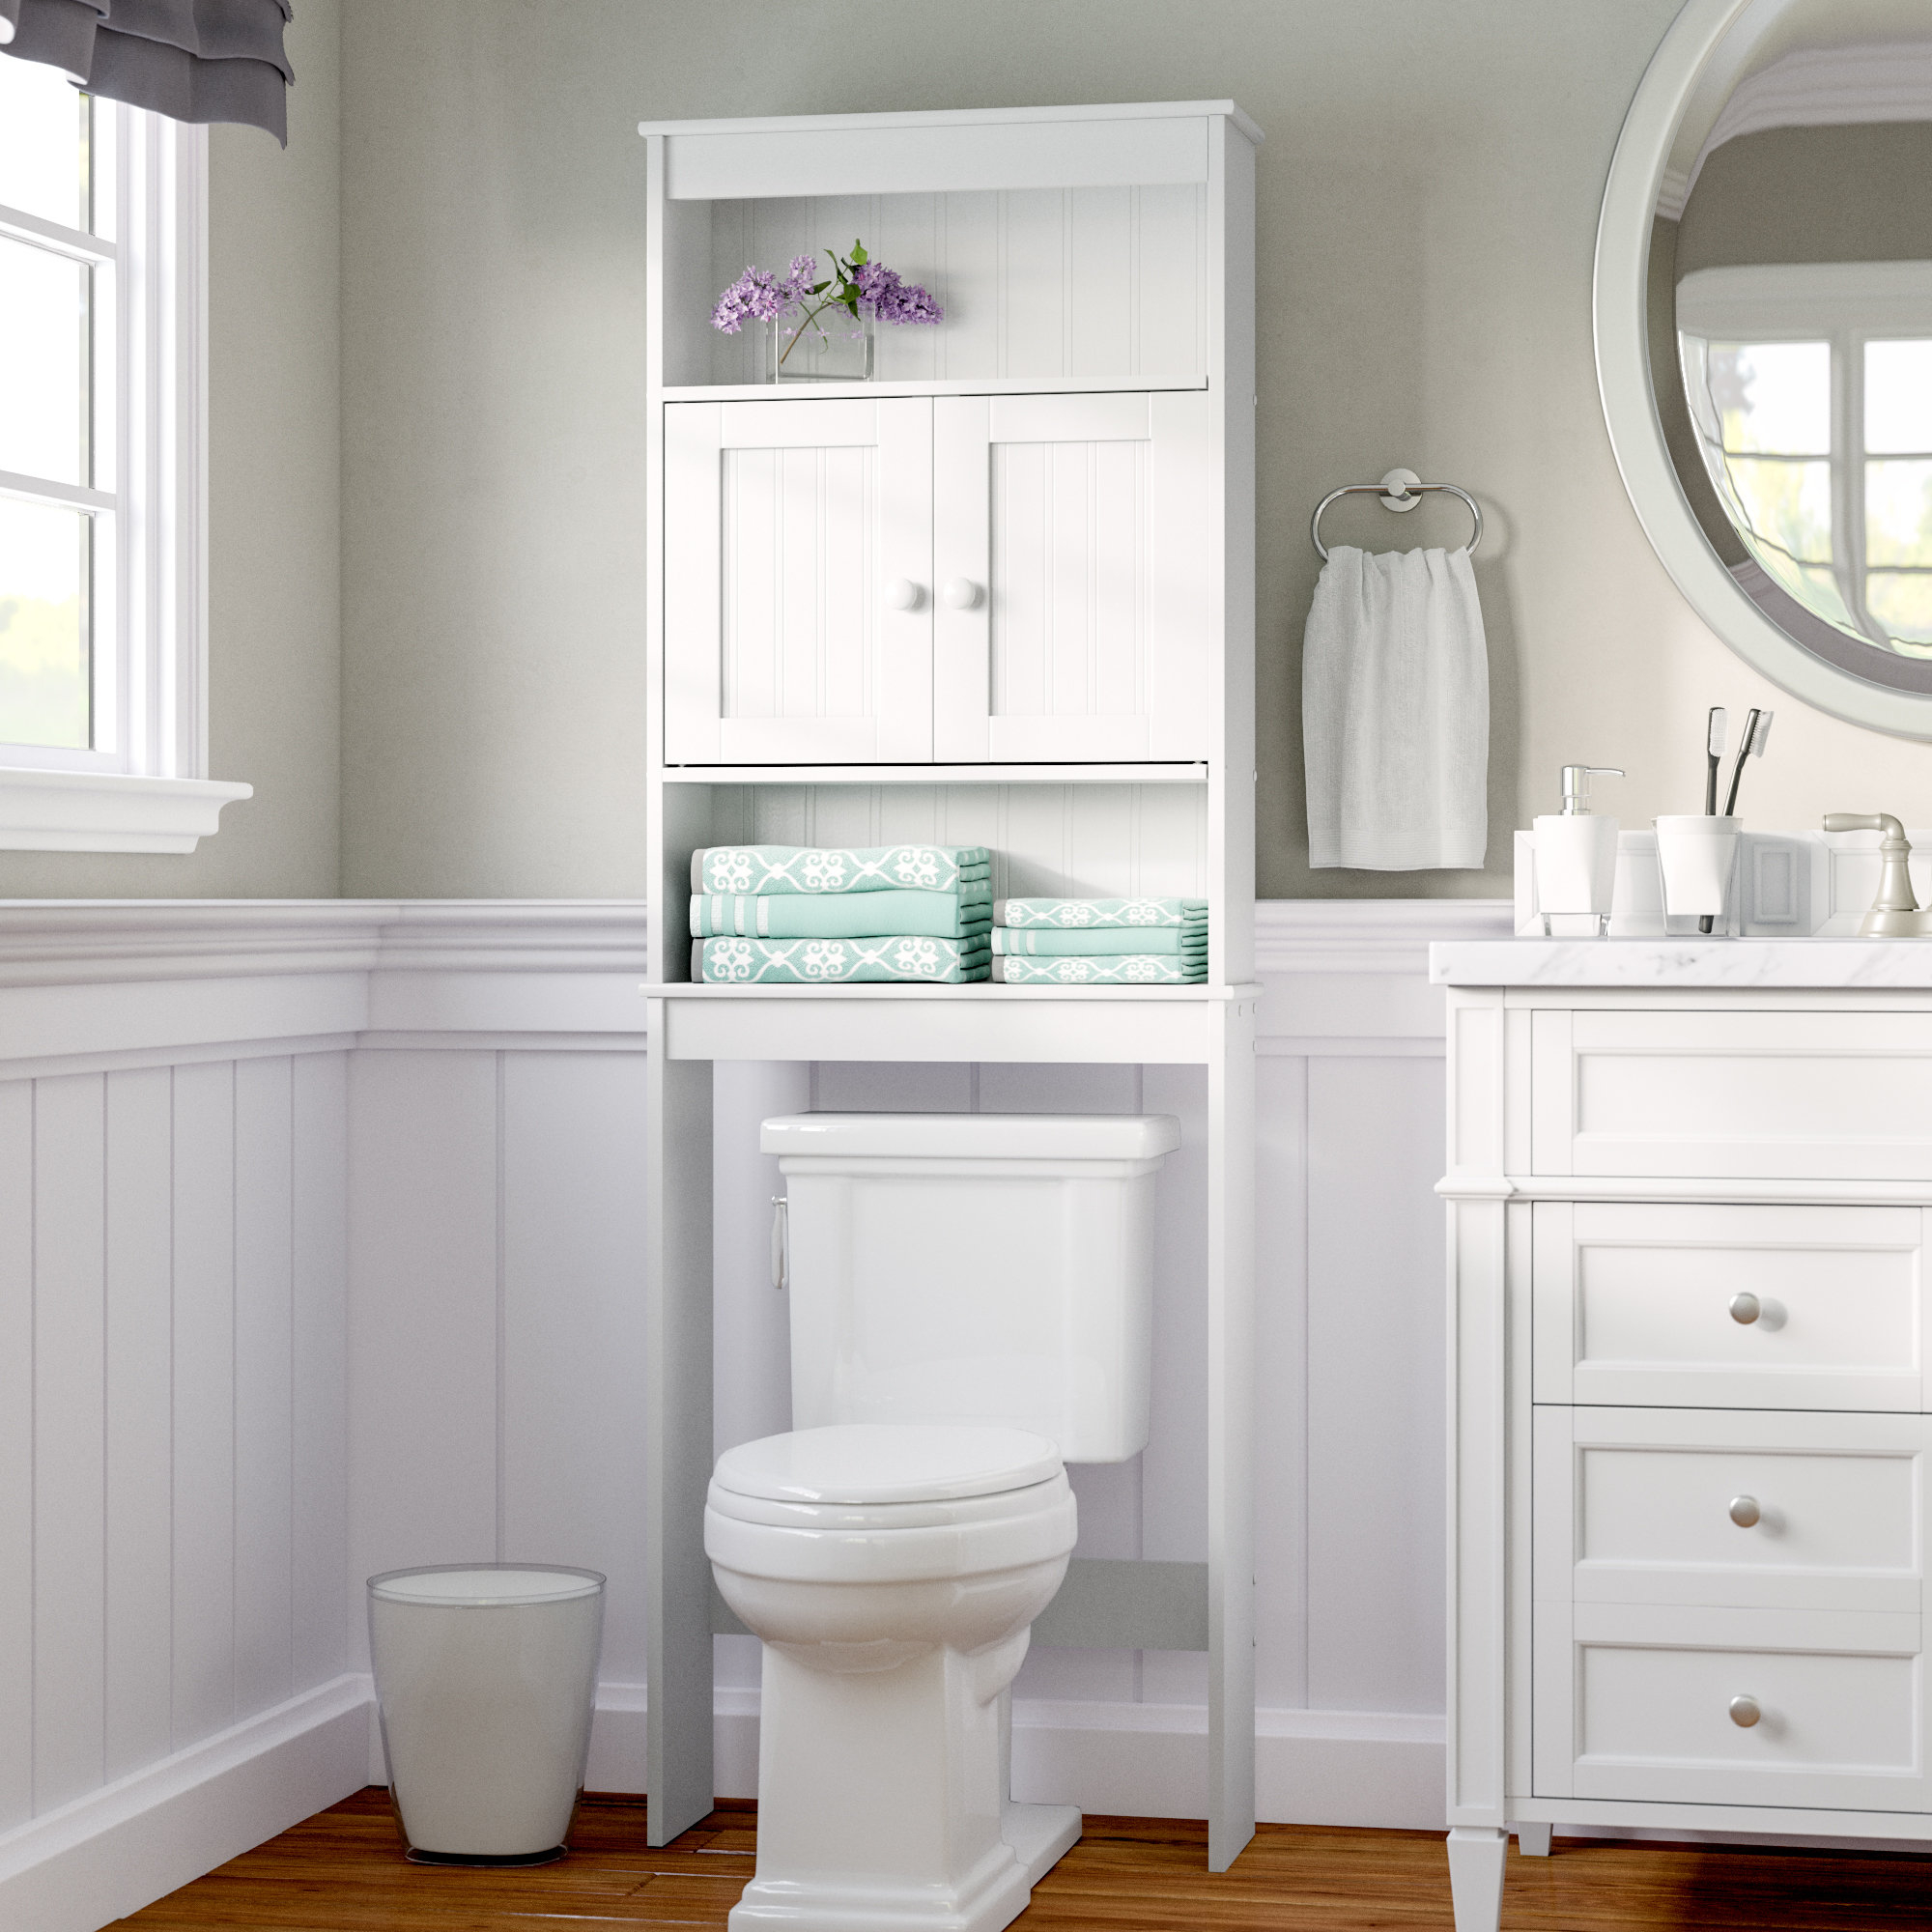 2325 W X 665 H Over The Toilet Storage regarding size 2000 X 2000